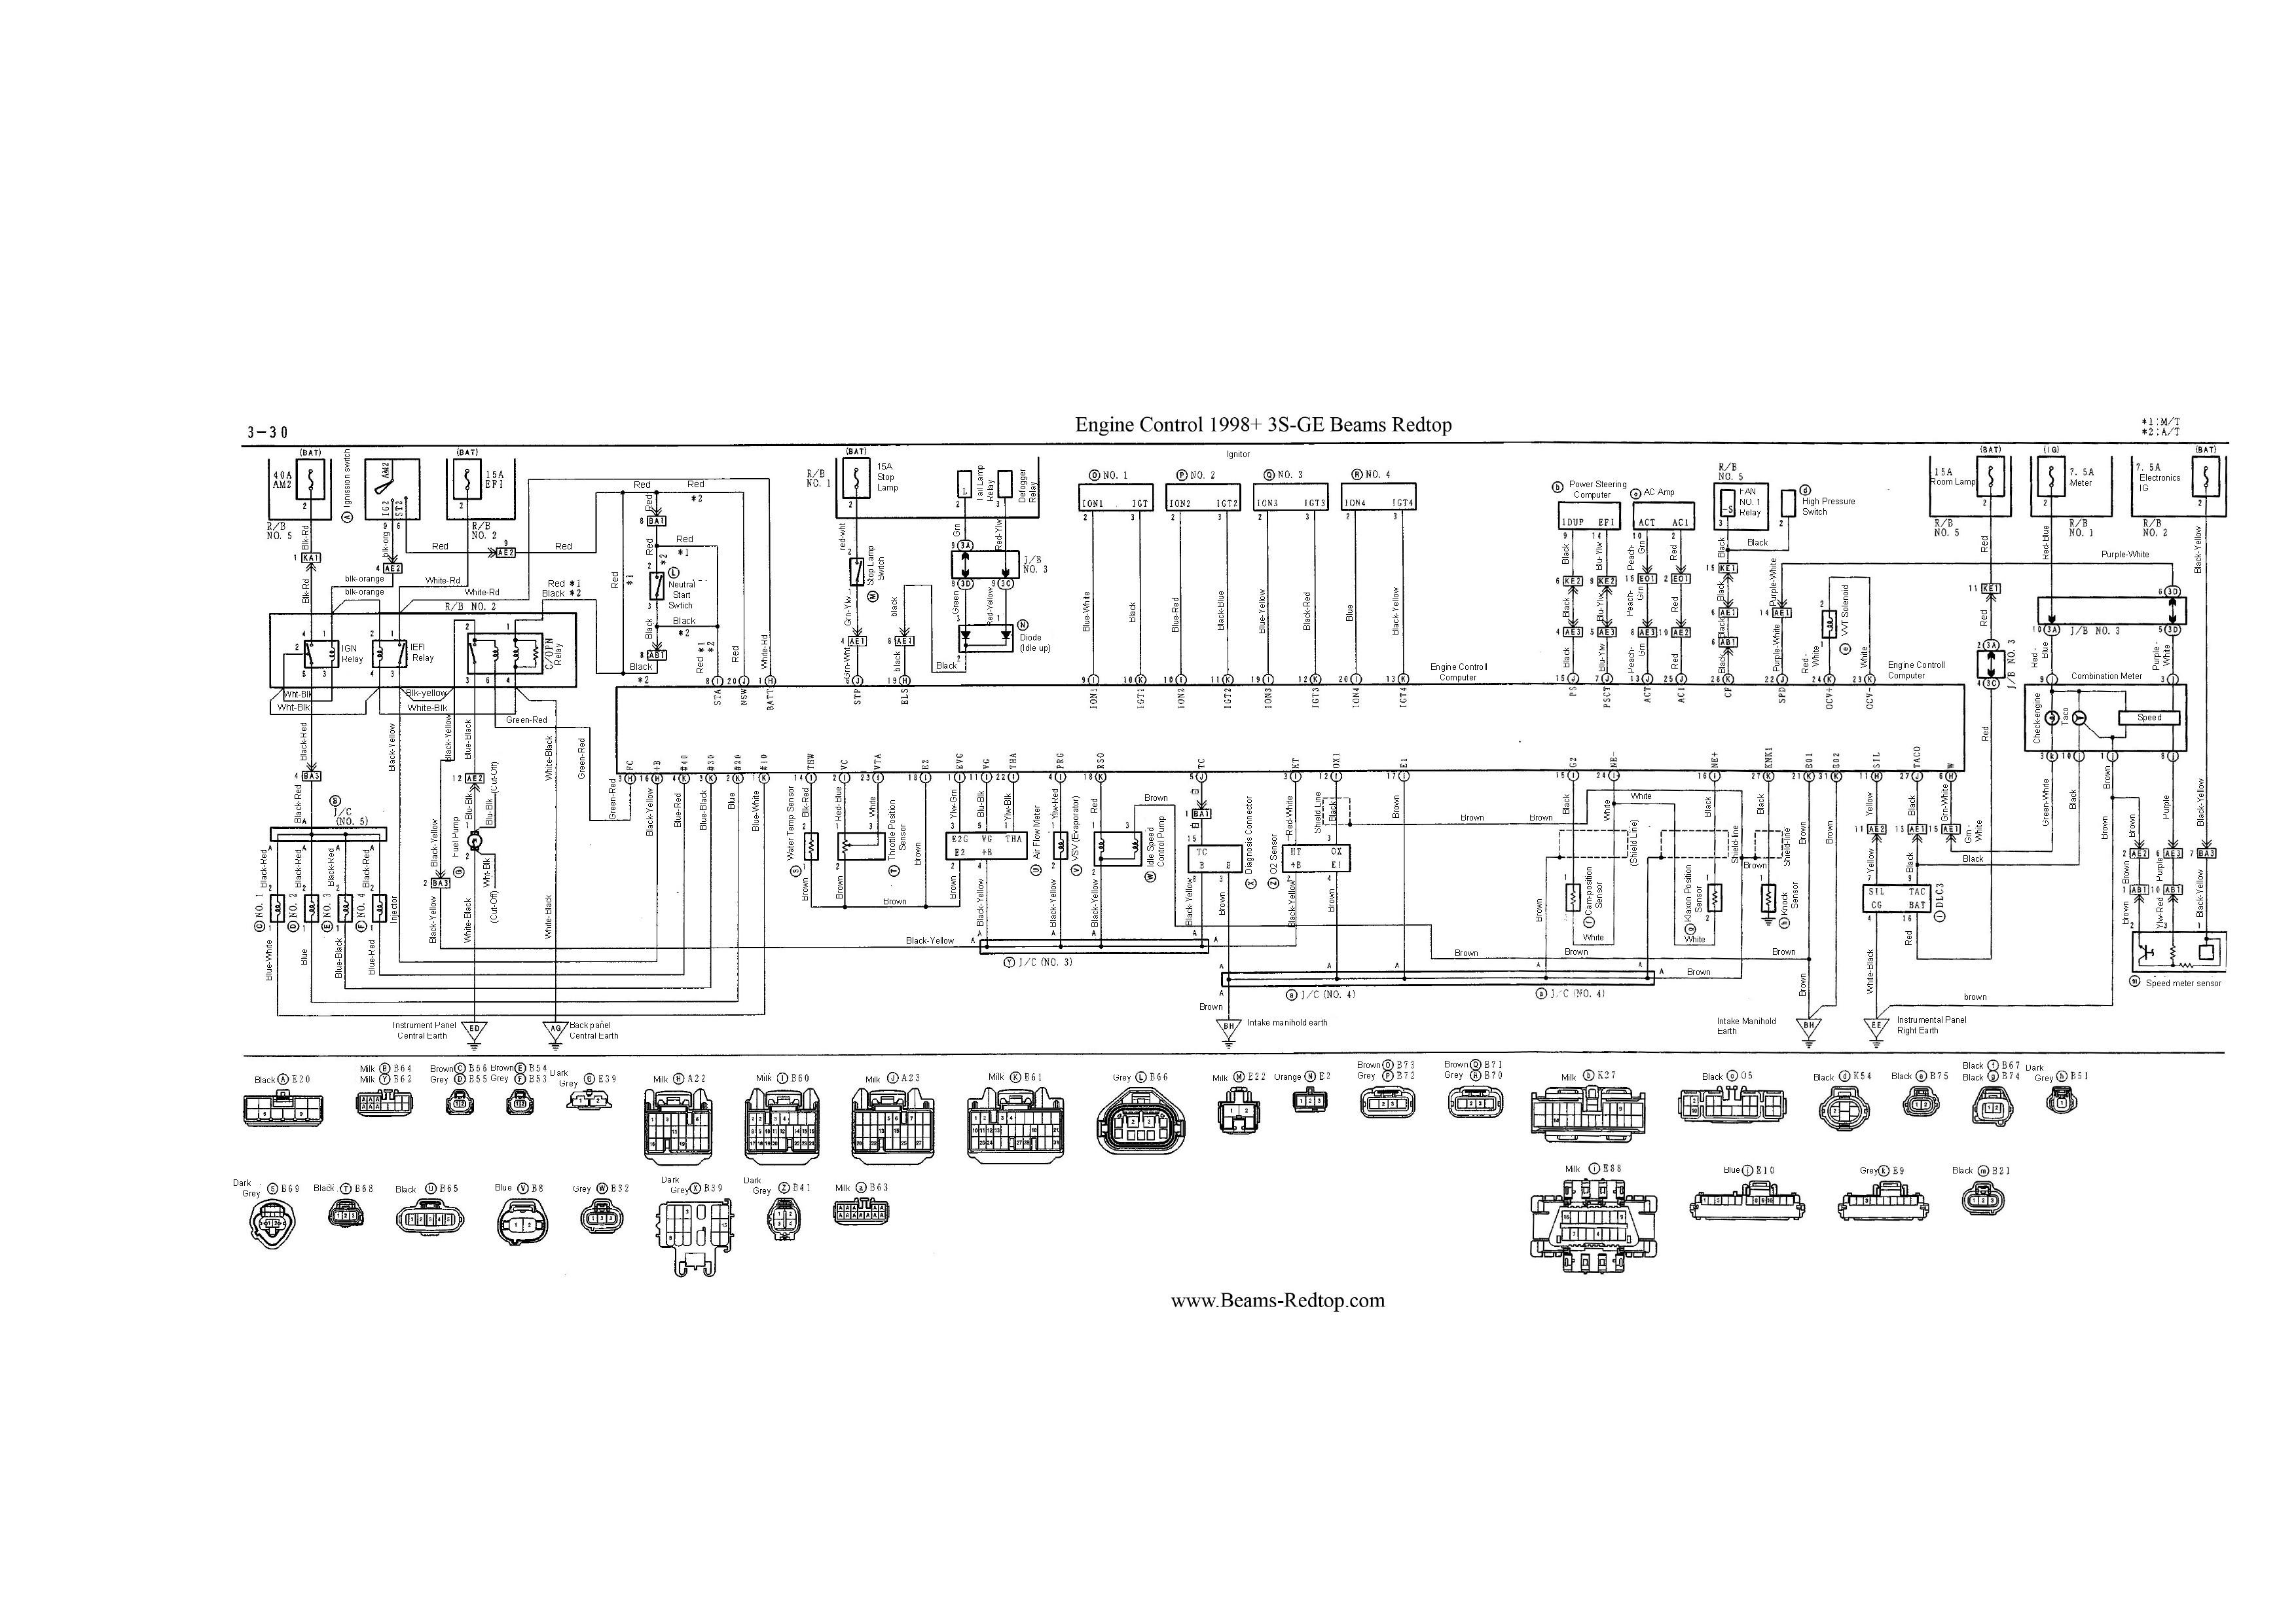 2001 toyota Celica Engine Diagram 3sge Beams Wiring Diagram Layout Wiring Diagrams • Of 2001 toyota Celica Engine Diagram